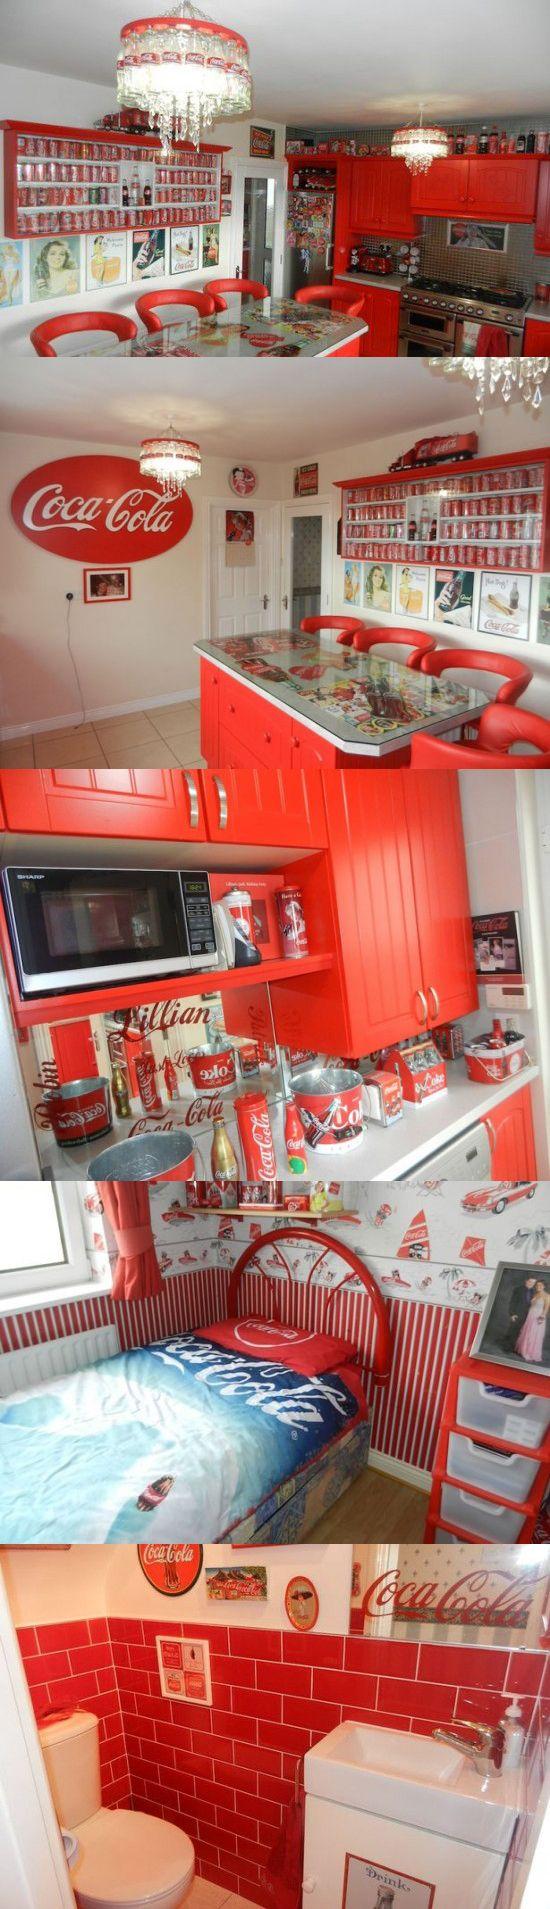 Pin von TomandSaundra Troup auf *All Things Coke* | Pinterest ...